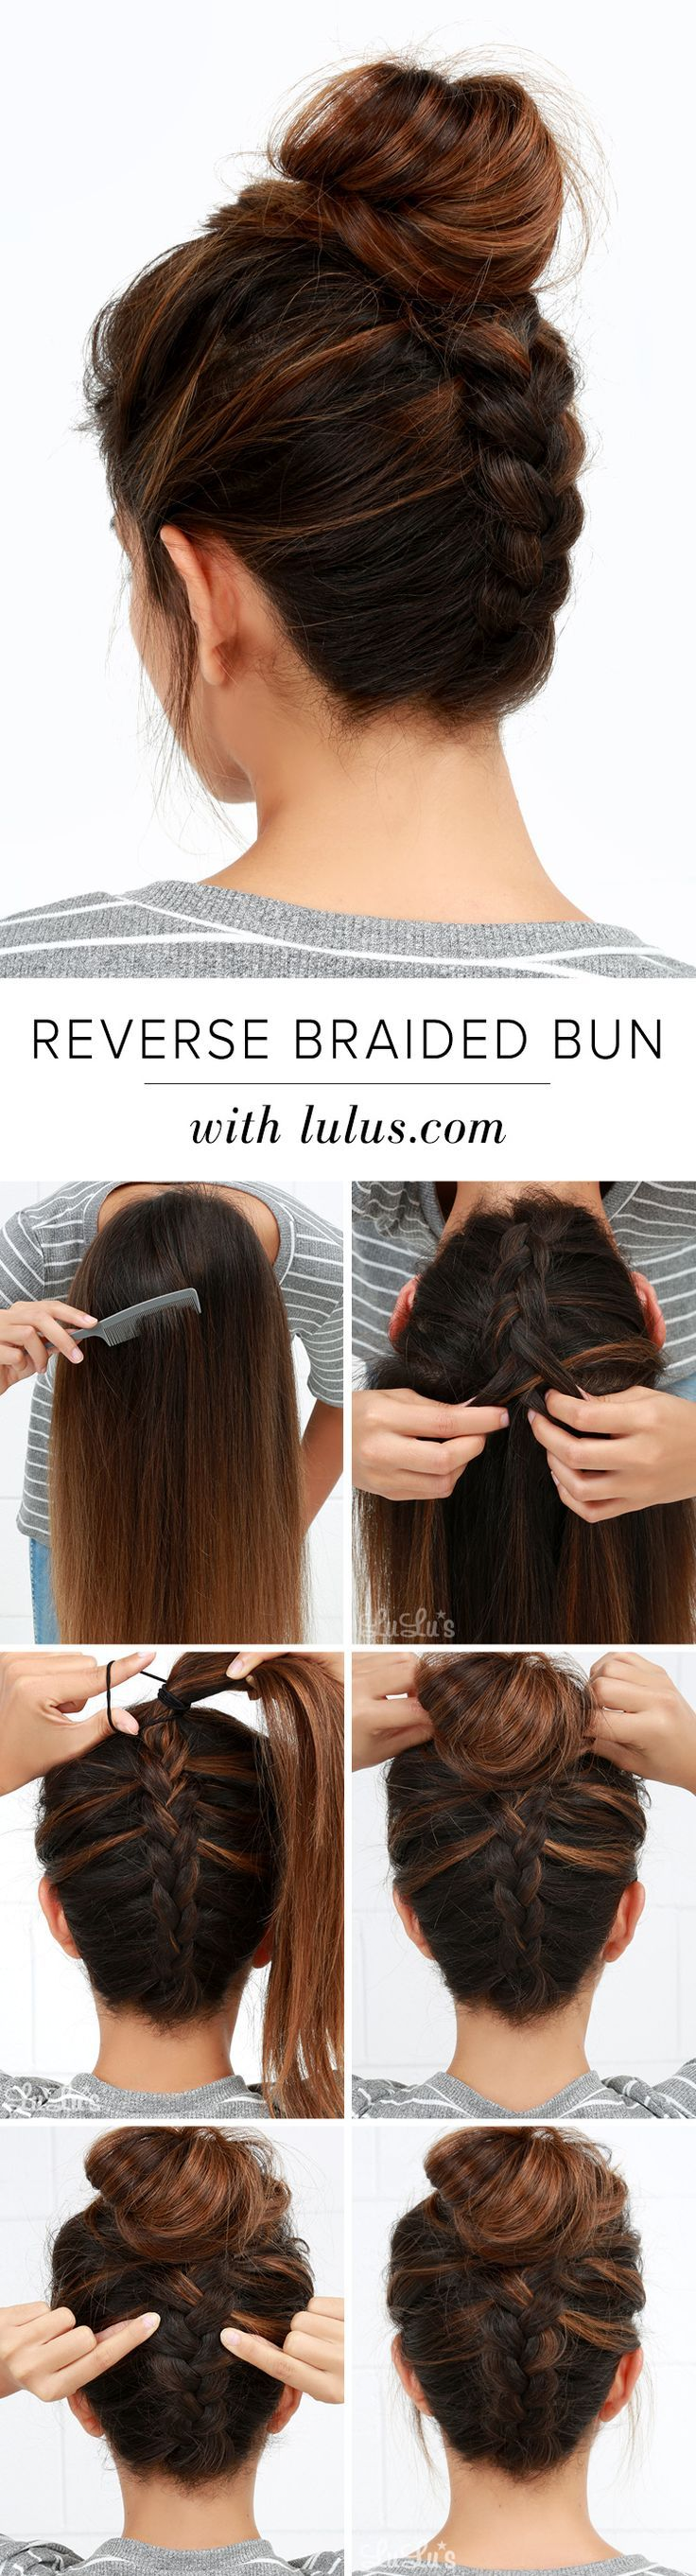 DIY Reverse Braided Bun Hair Tutorial. Photo tutorial step by step.